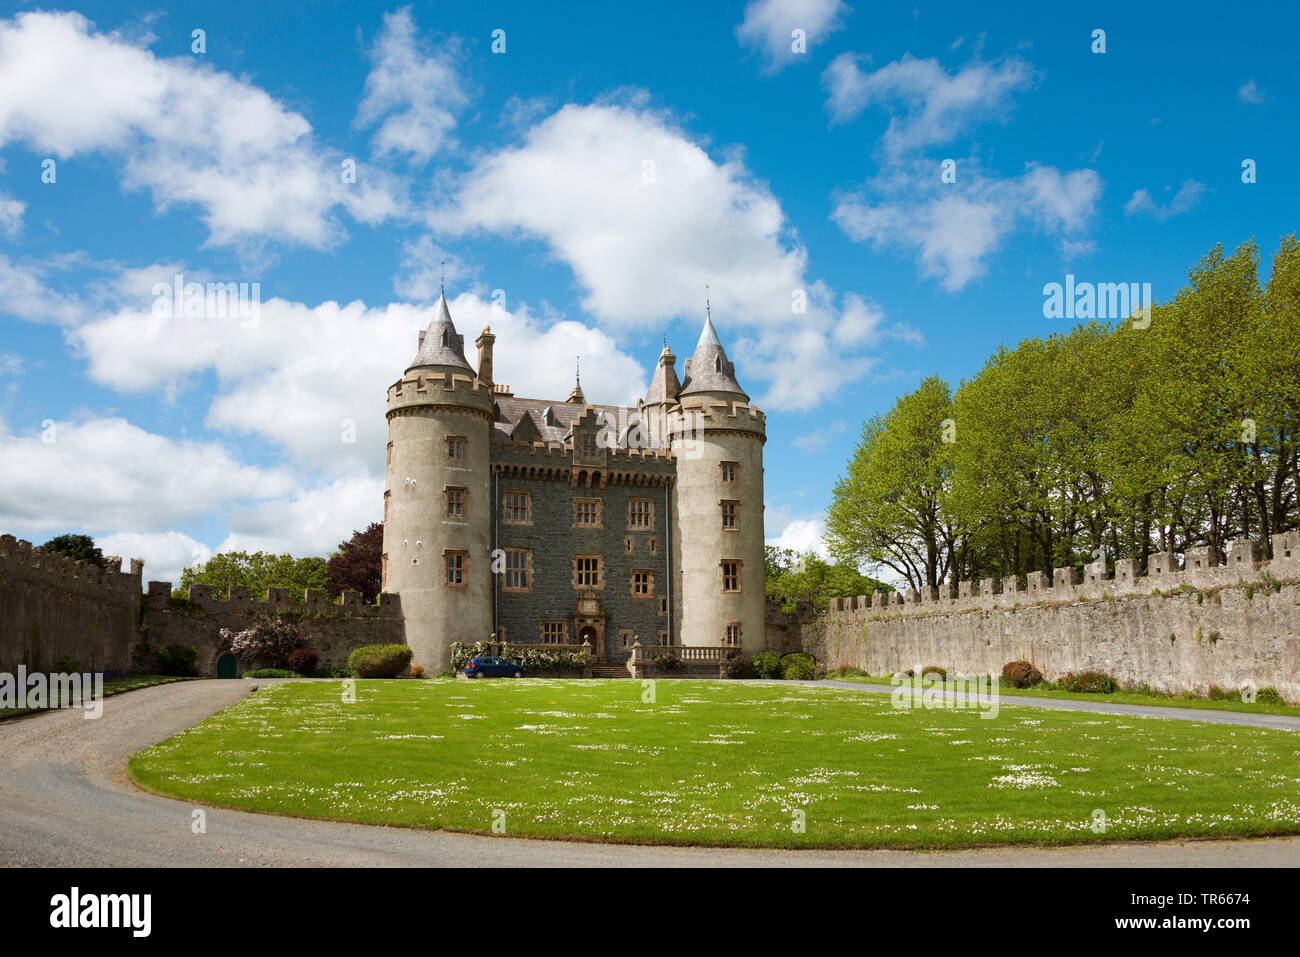 Killyleagh Castle, Ireland, Northern Ireland, County Down, Killyleagh - Stock Image